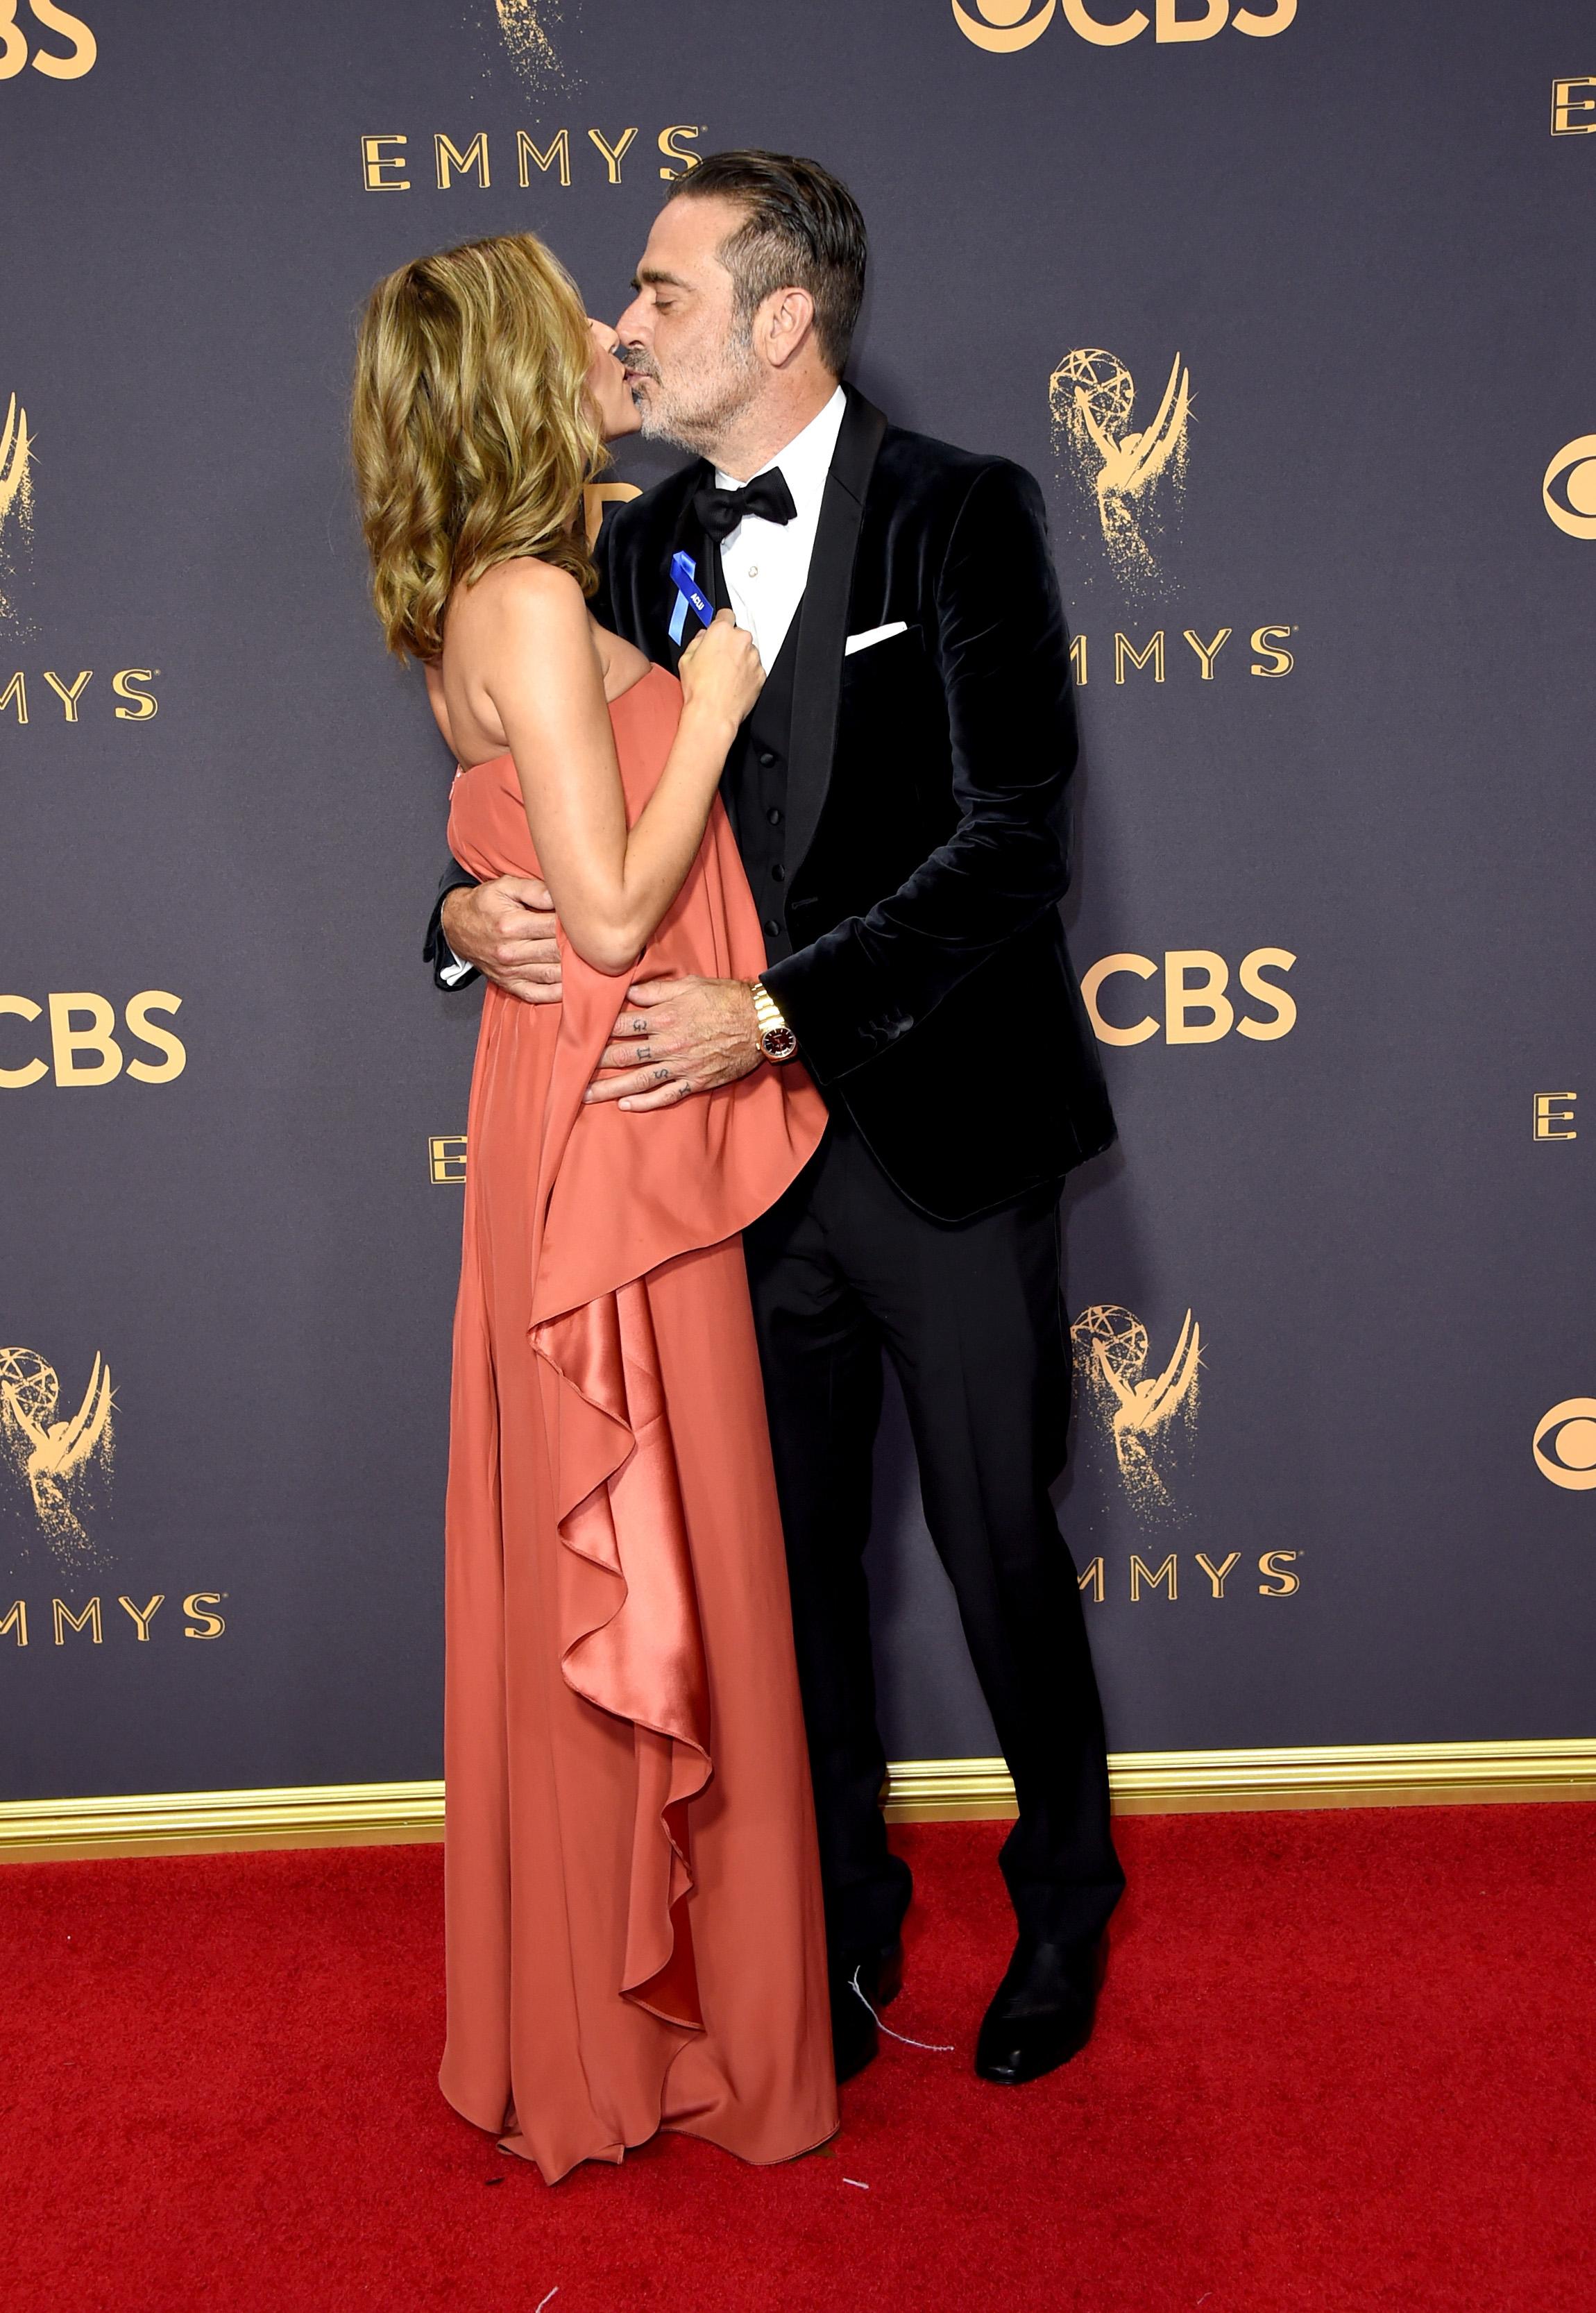 Jeffrey Dean Morgan and Hilarie Burton at 2017 Emmy Awards